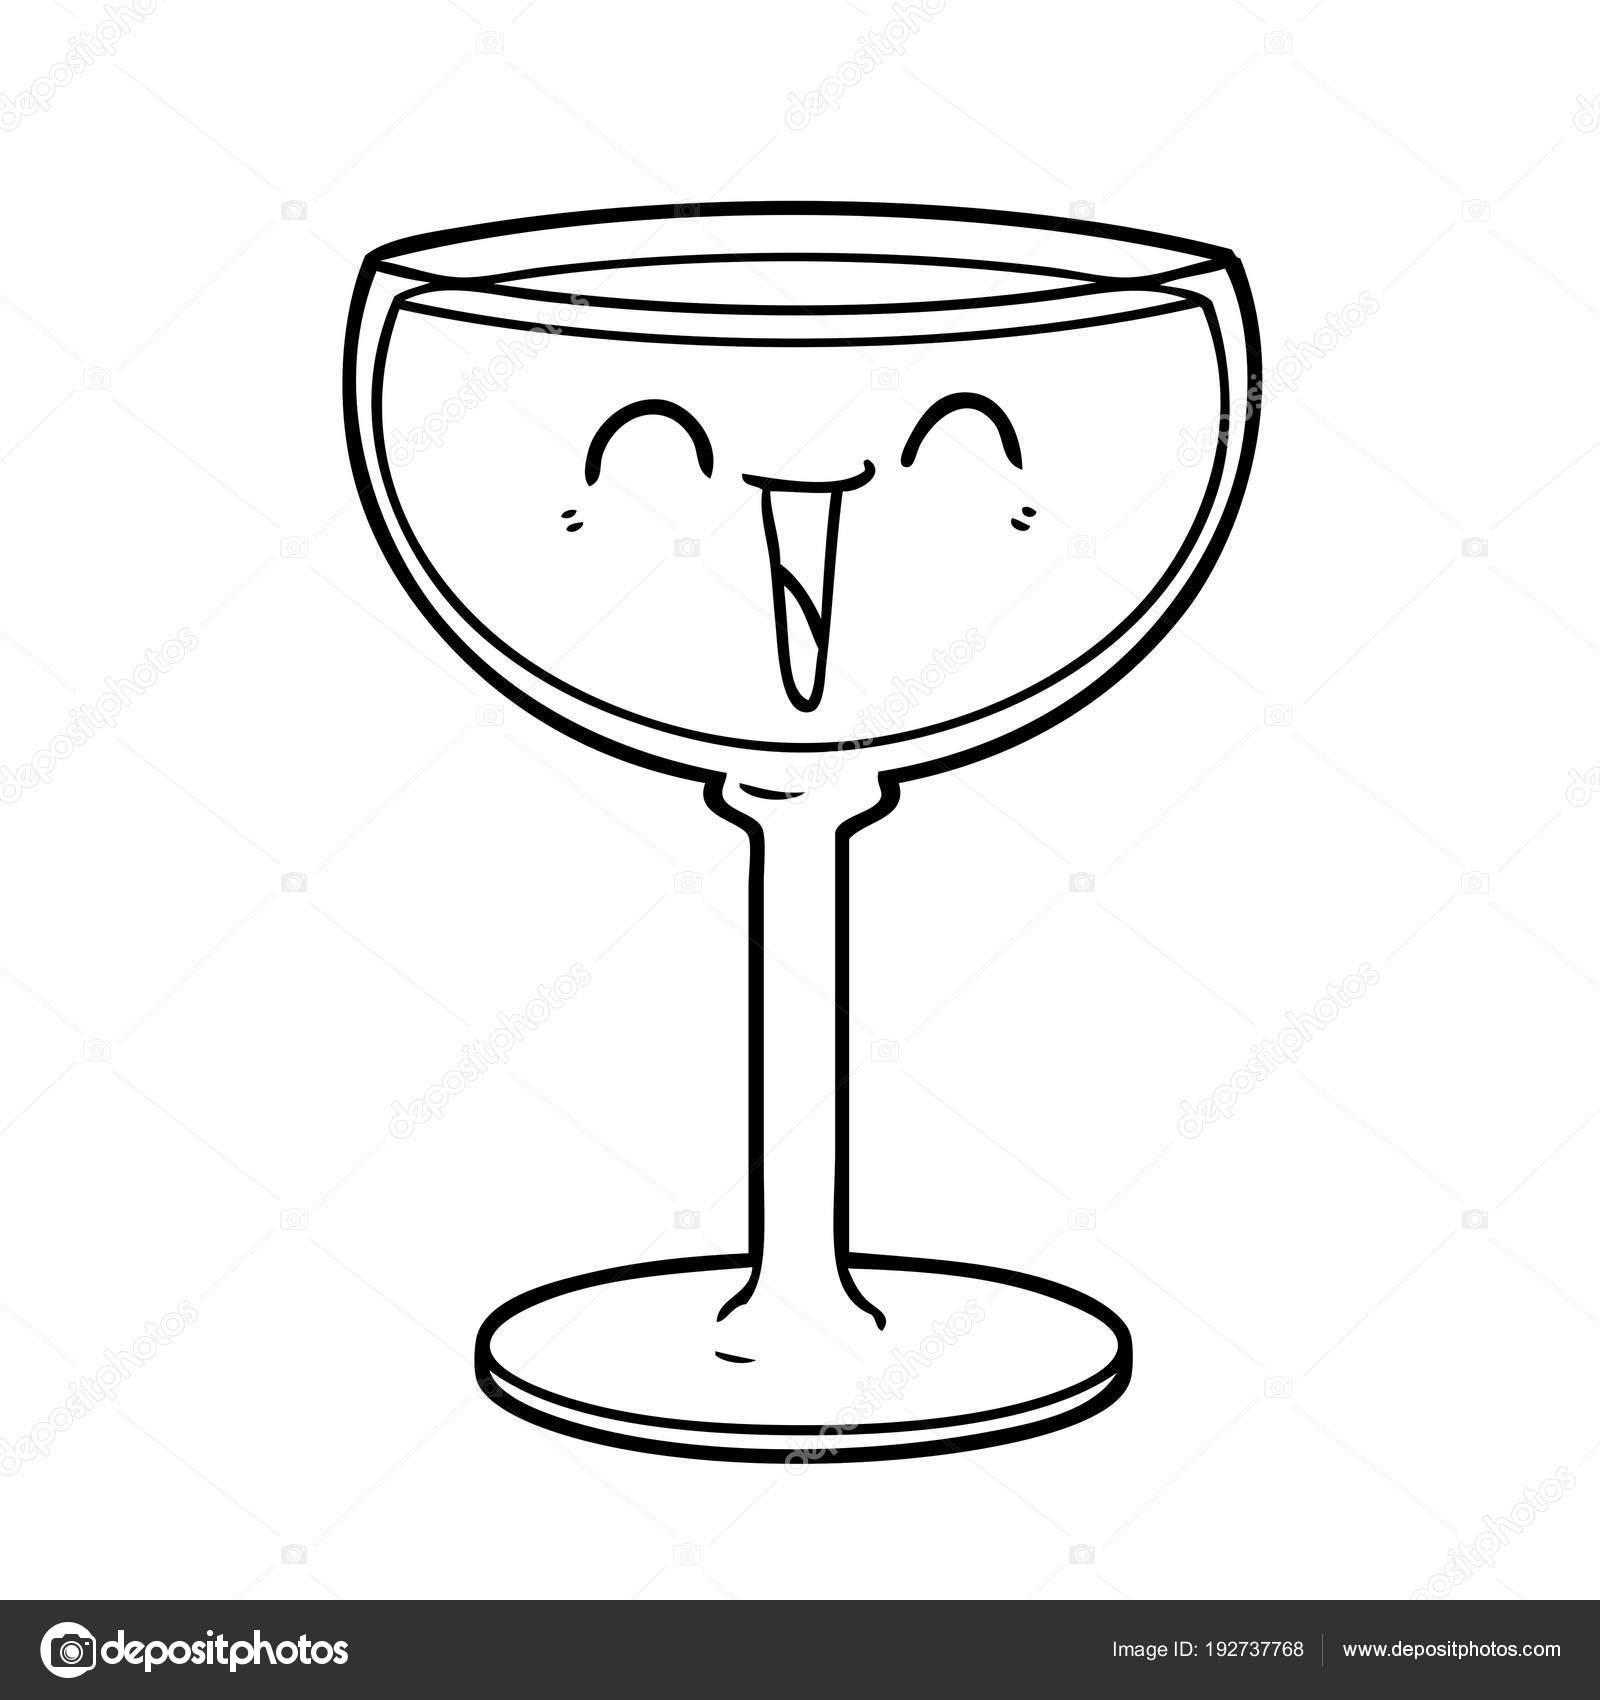 Dessin anim verre vin image vectorielle lineartestpilot - Dessin de verre ...